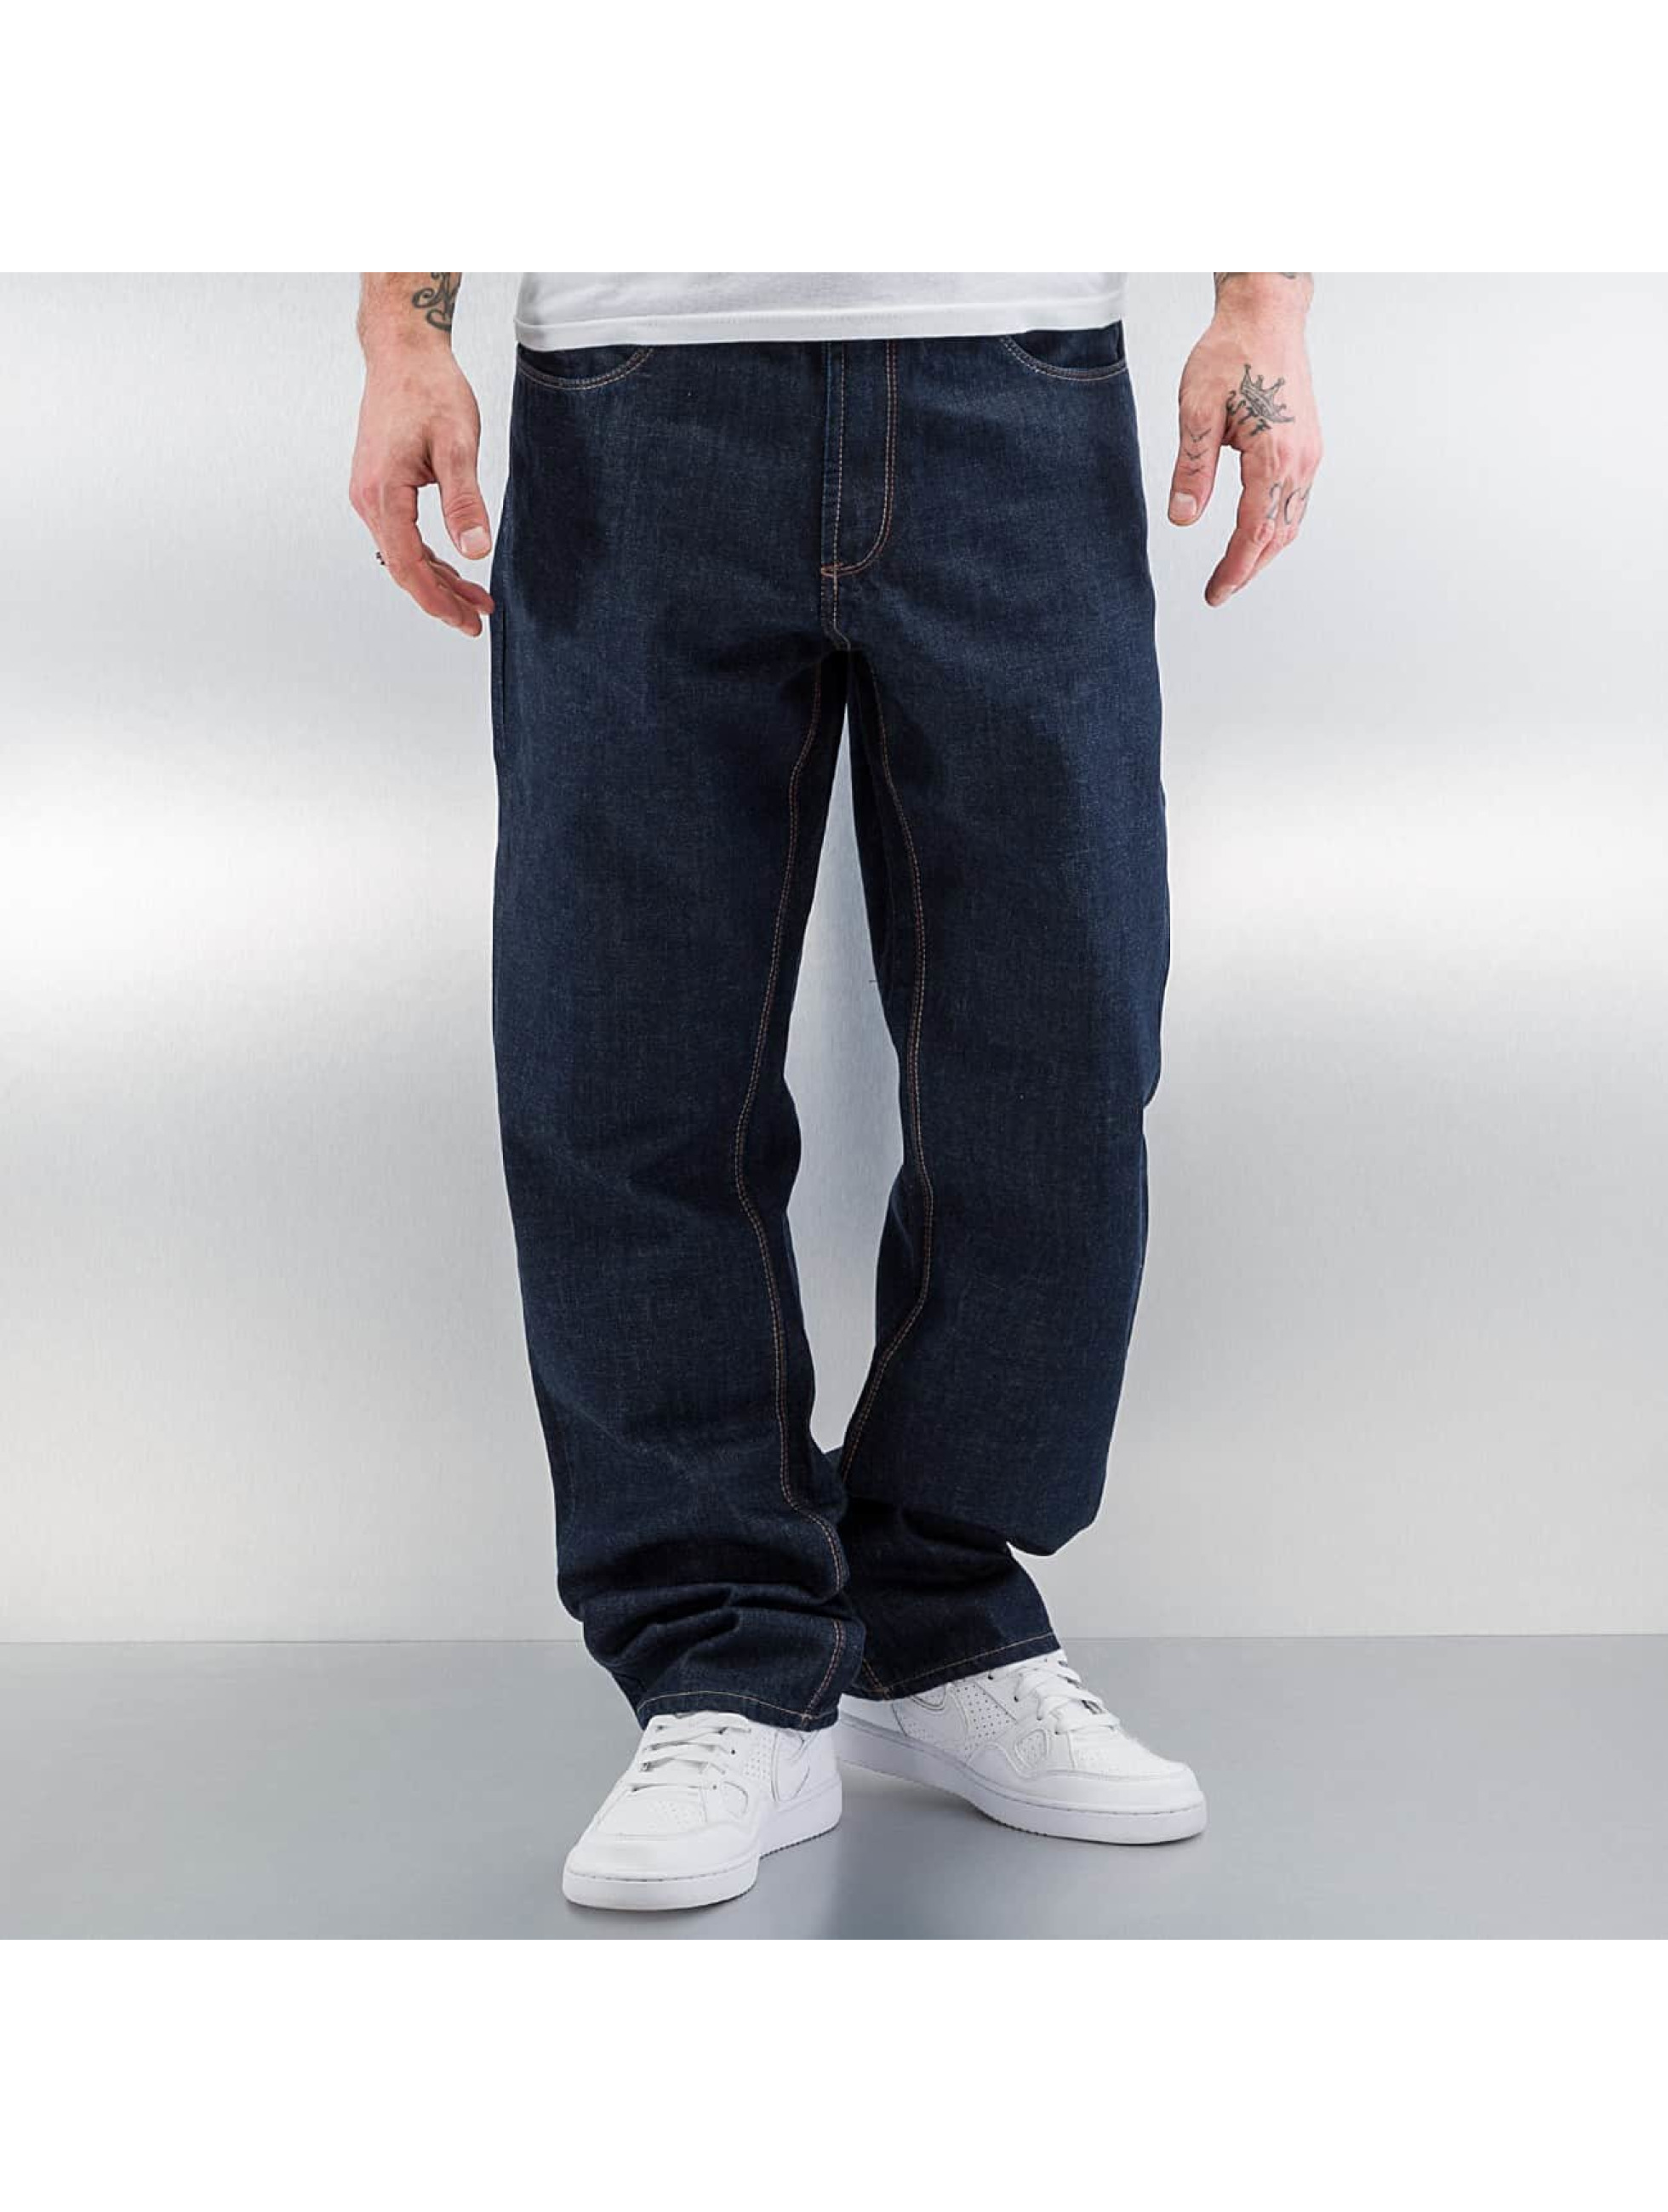 Reell Jeans Männer Baggy Drifter in blau